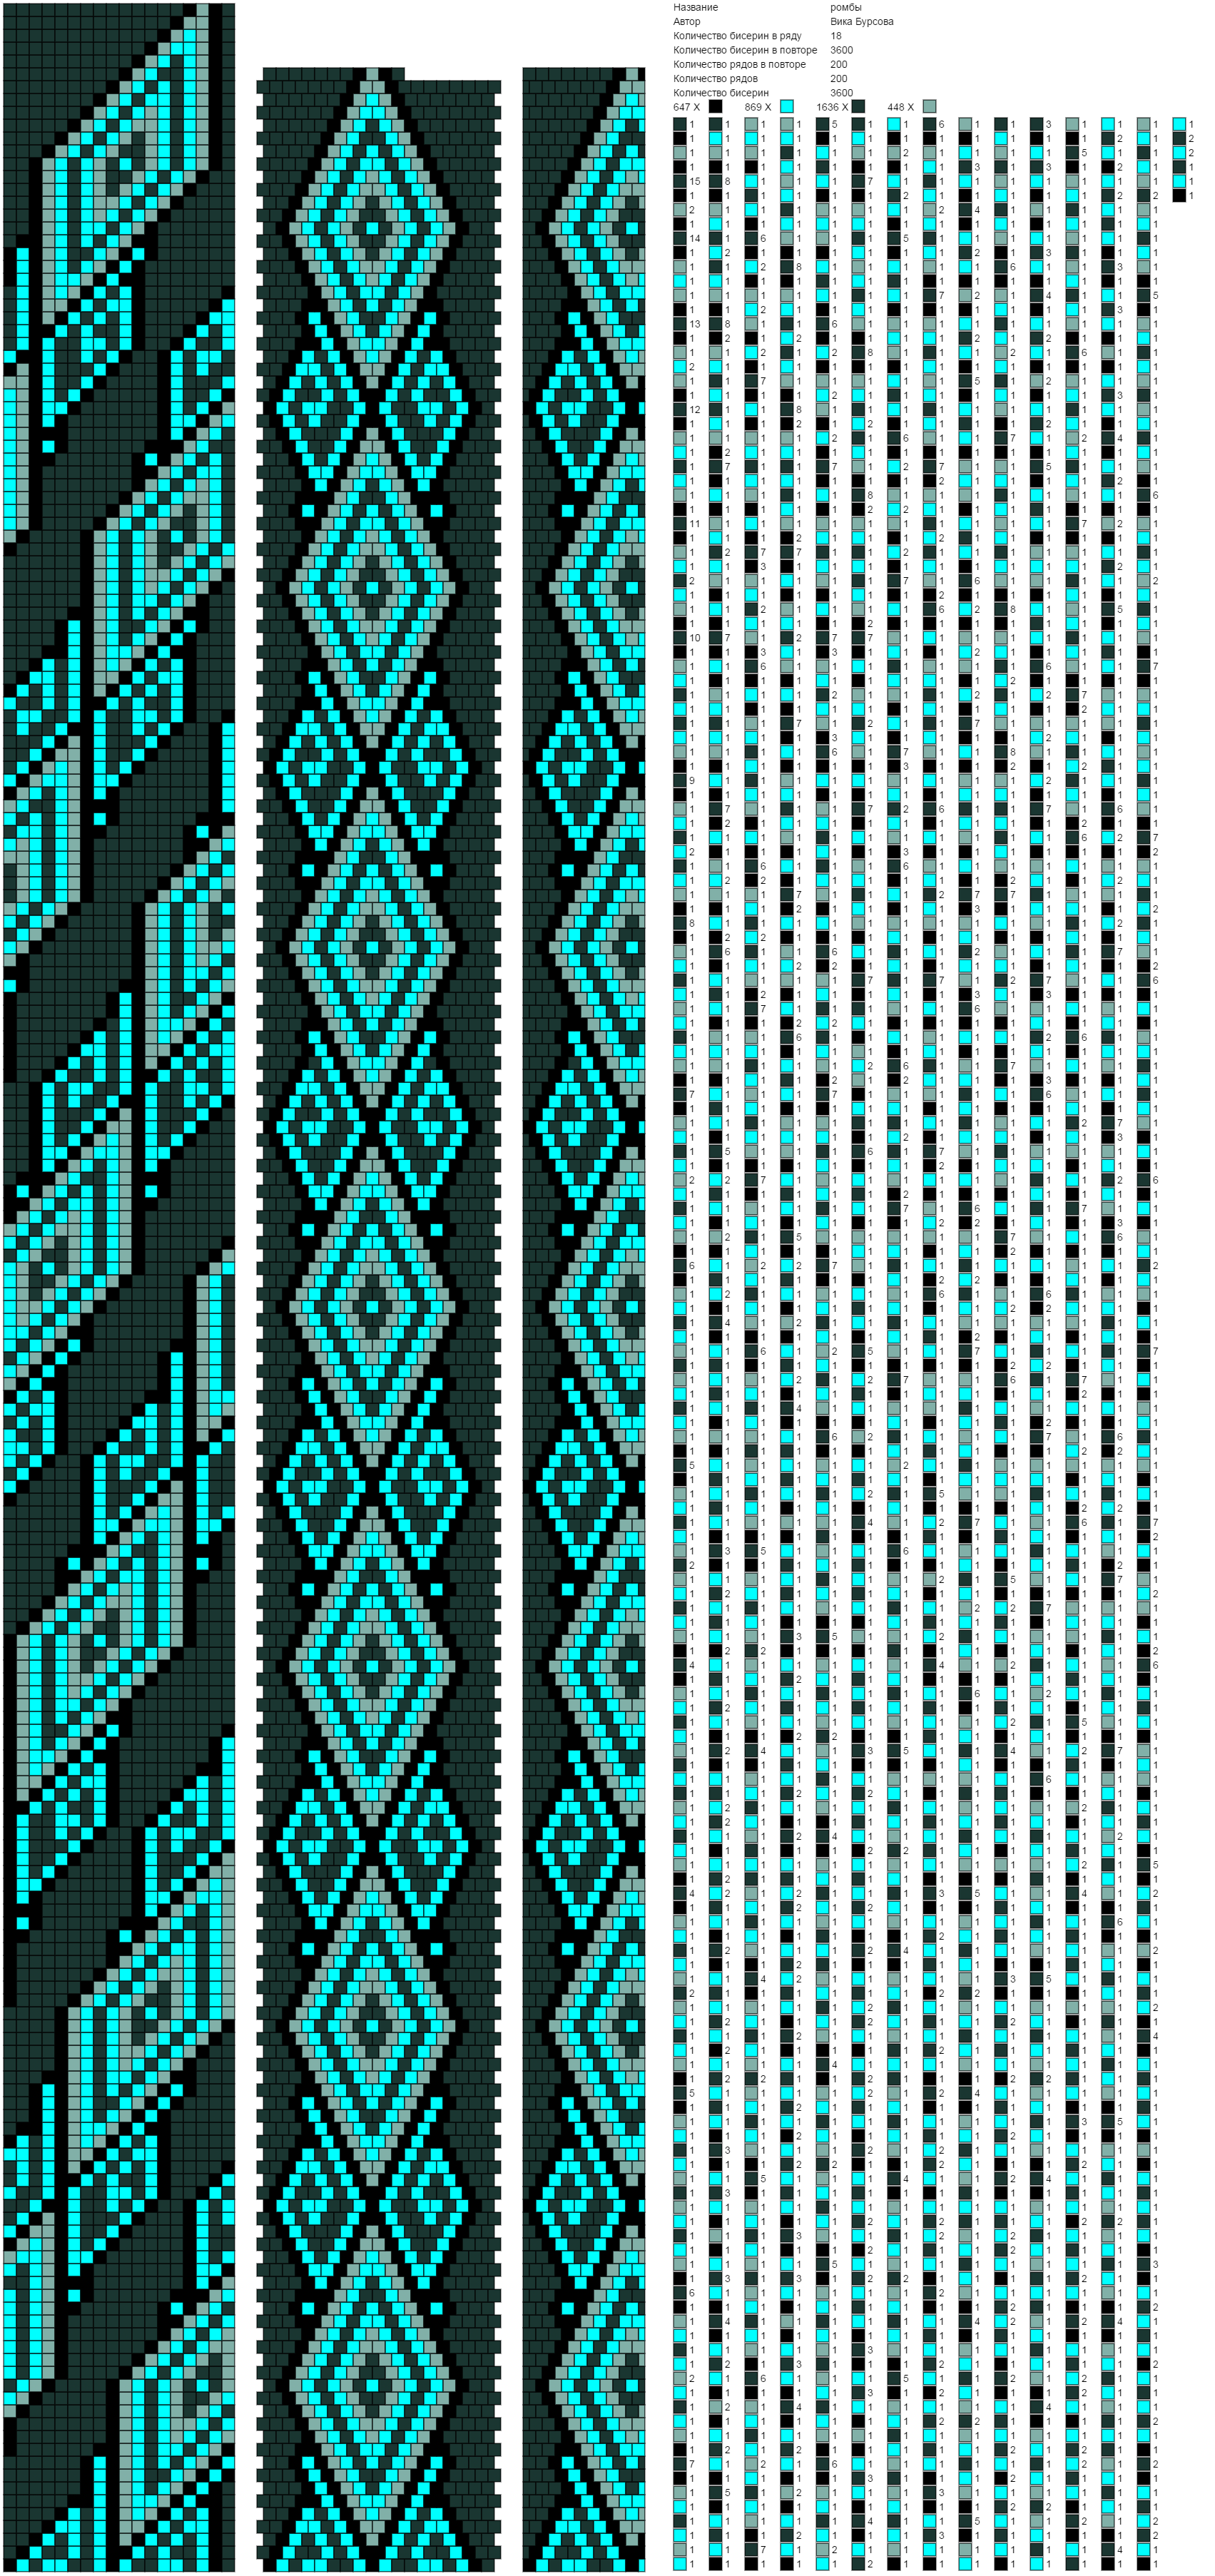 5c1ce3a58a96cc7a021627ad99c04e11.png (1703×3611) | Бисерные жгуты ...